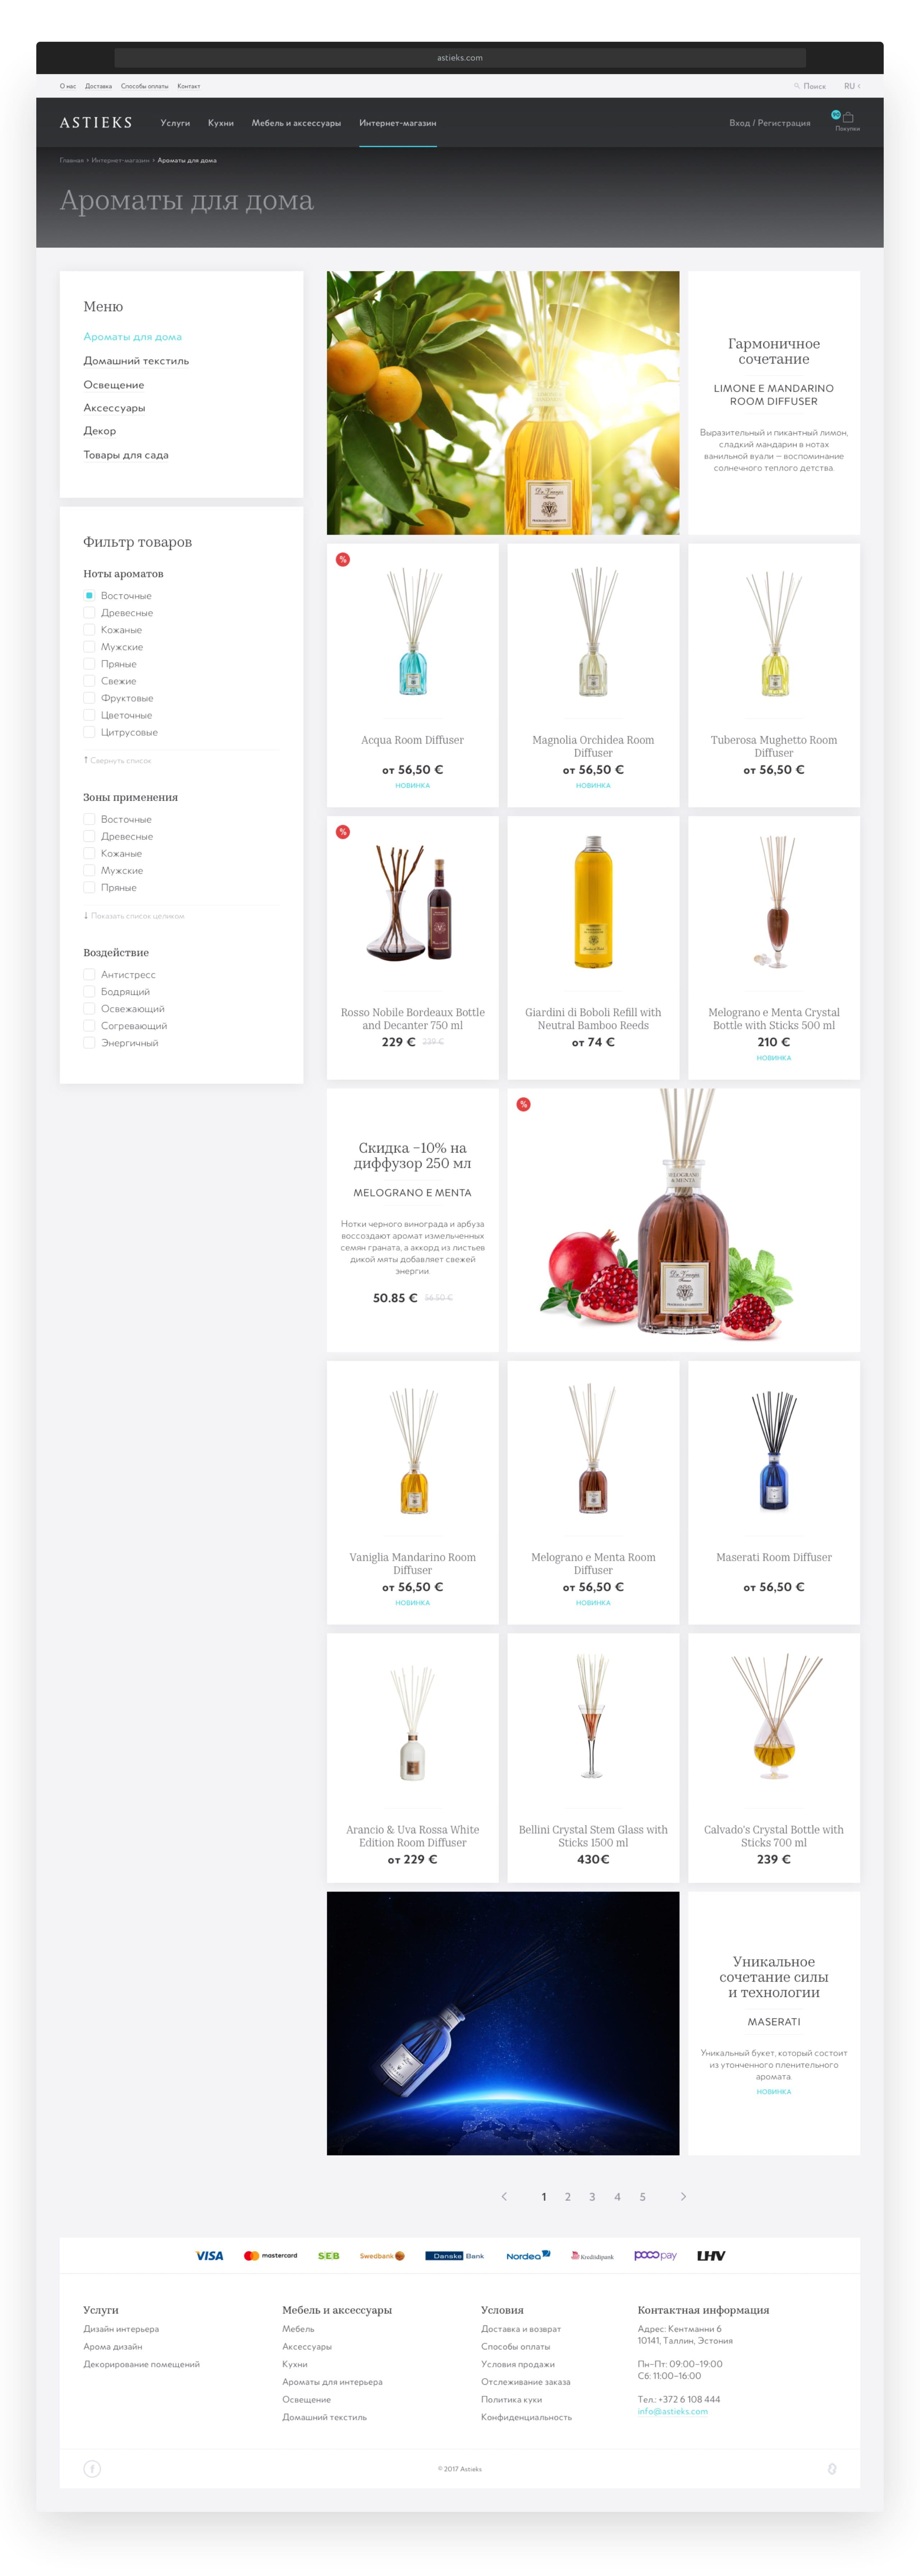 Astieks online store